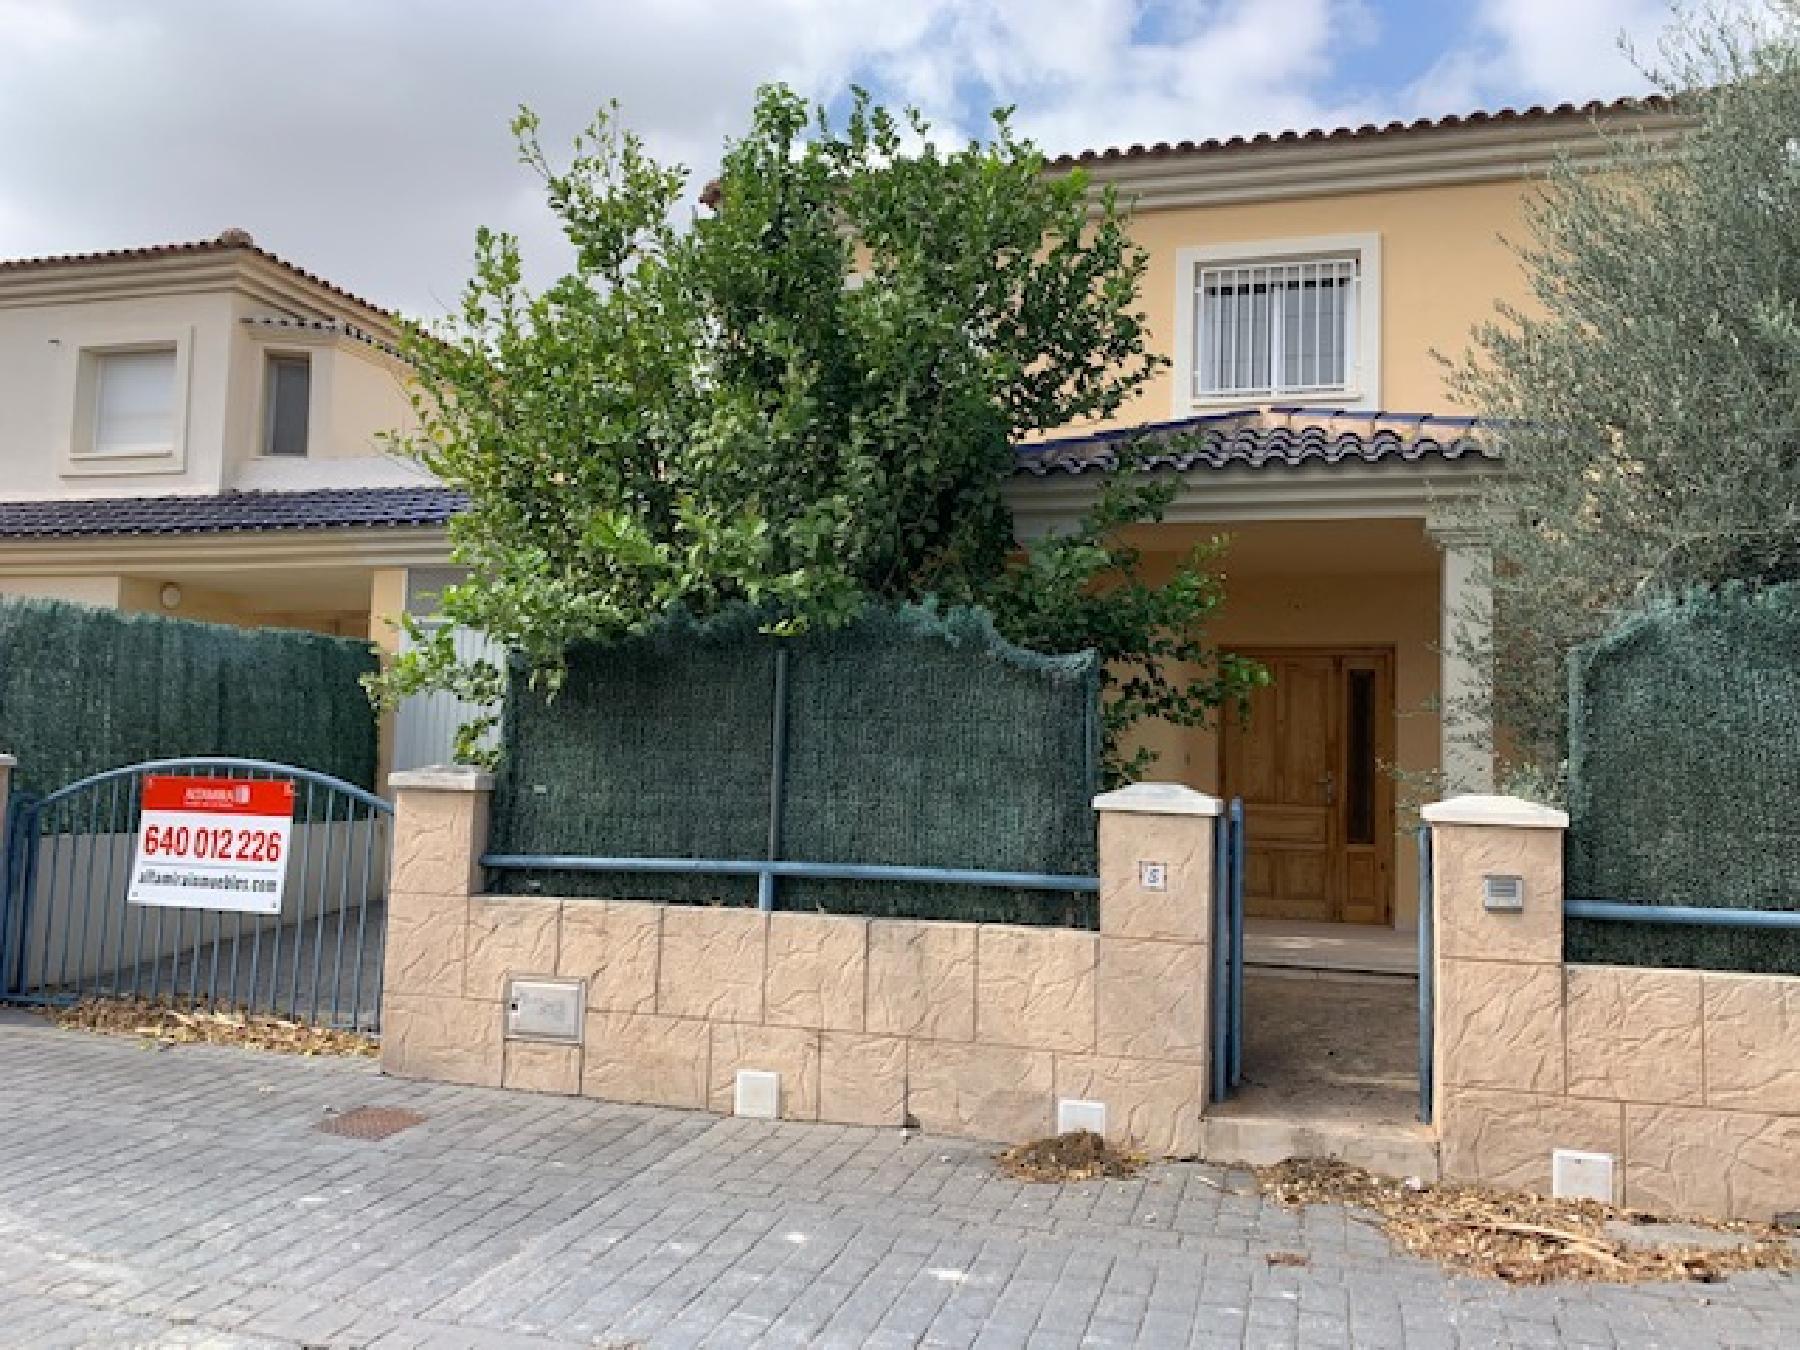 House in Murcia (Ciudad)